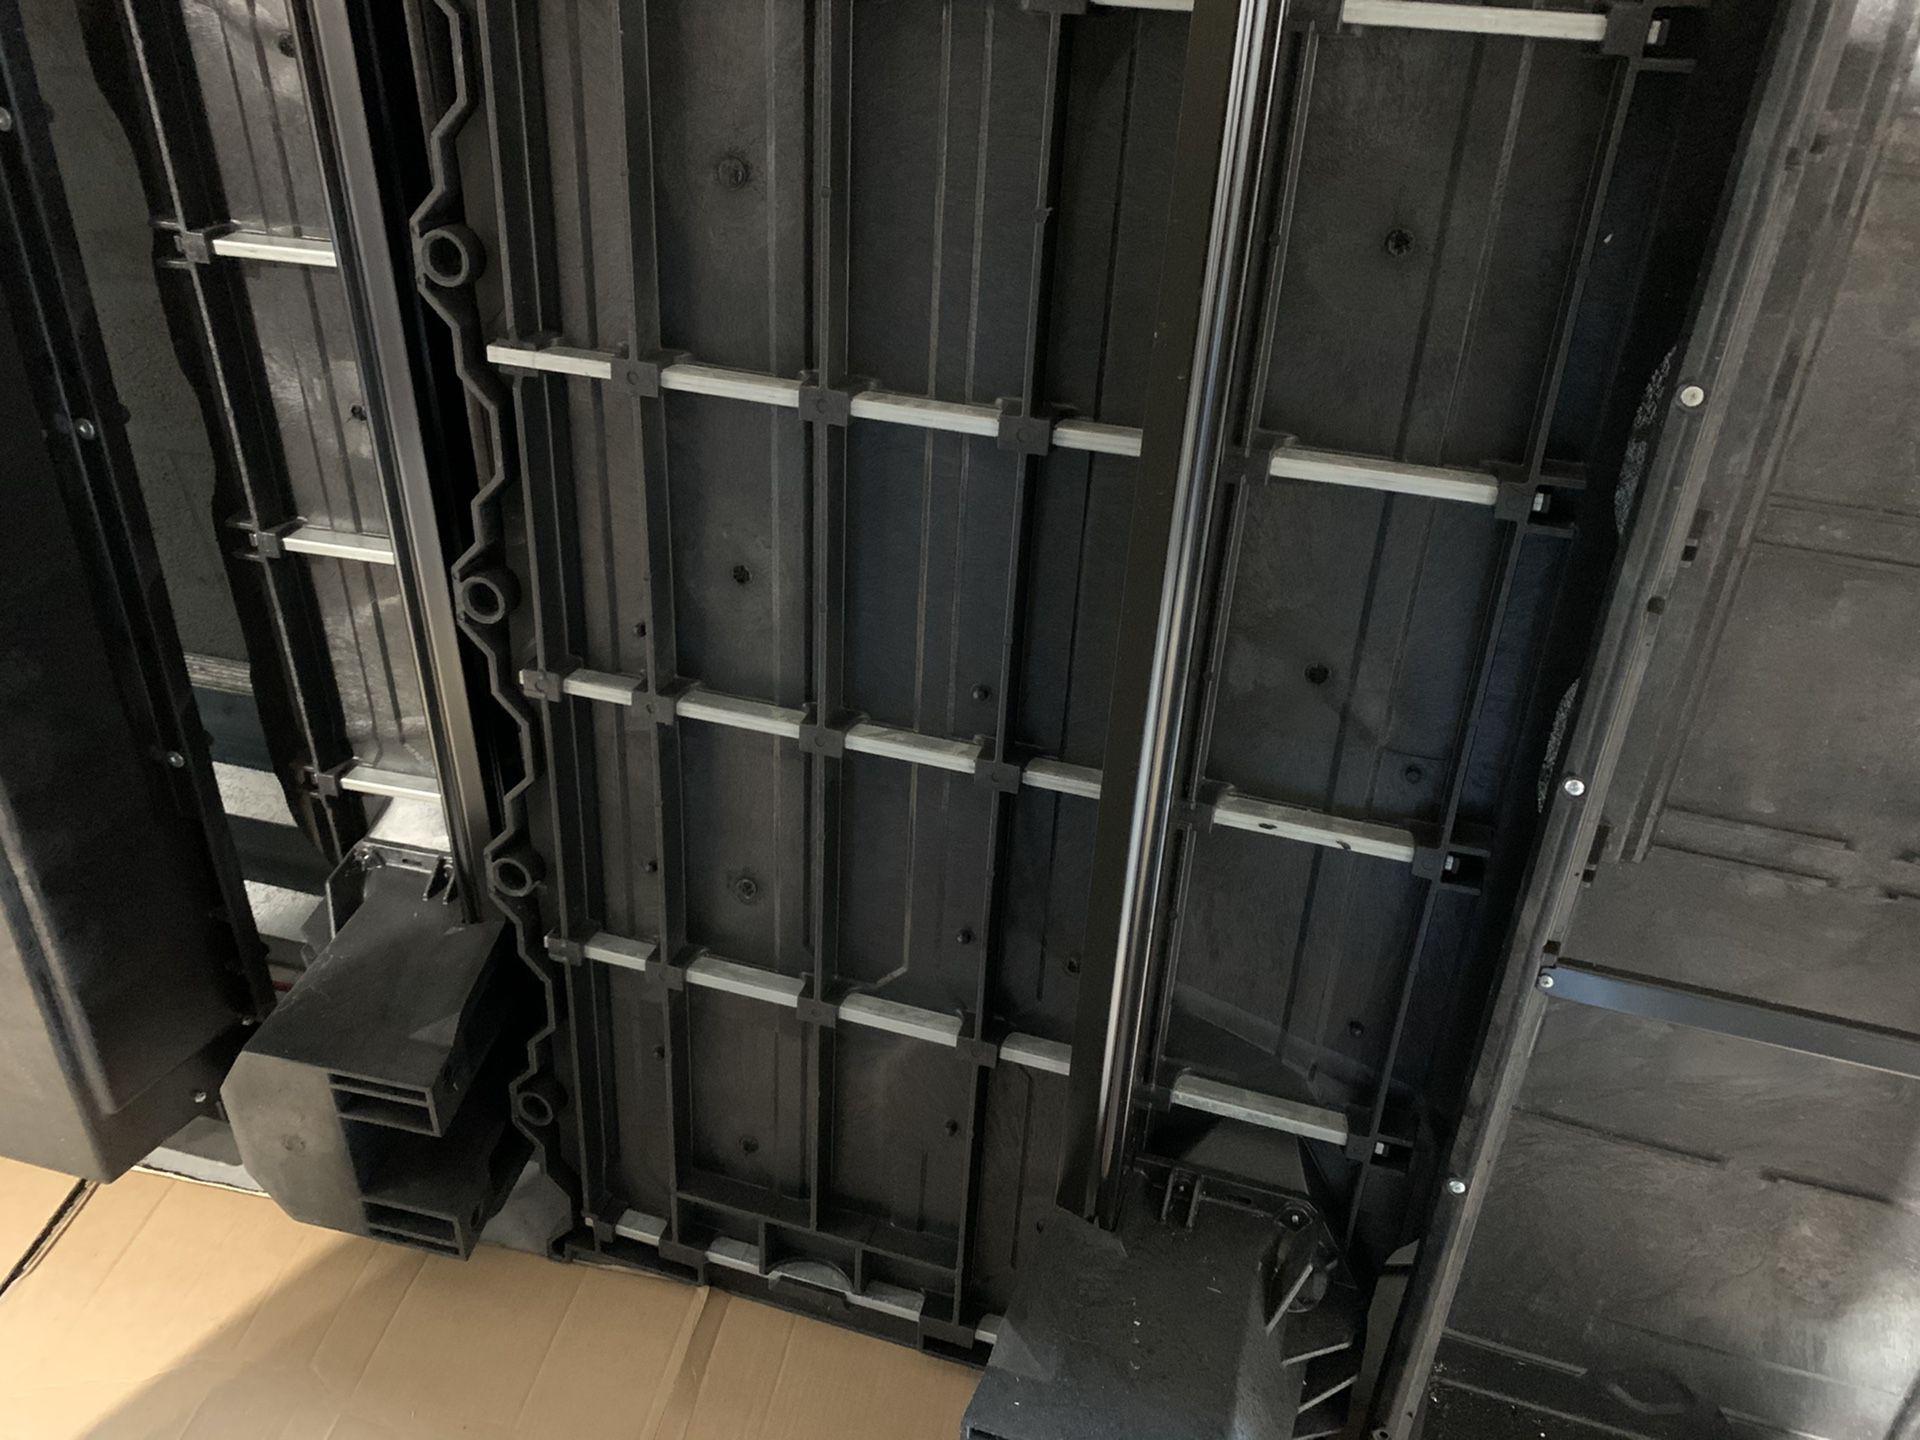 Truck bed storage system